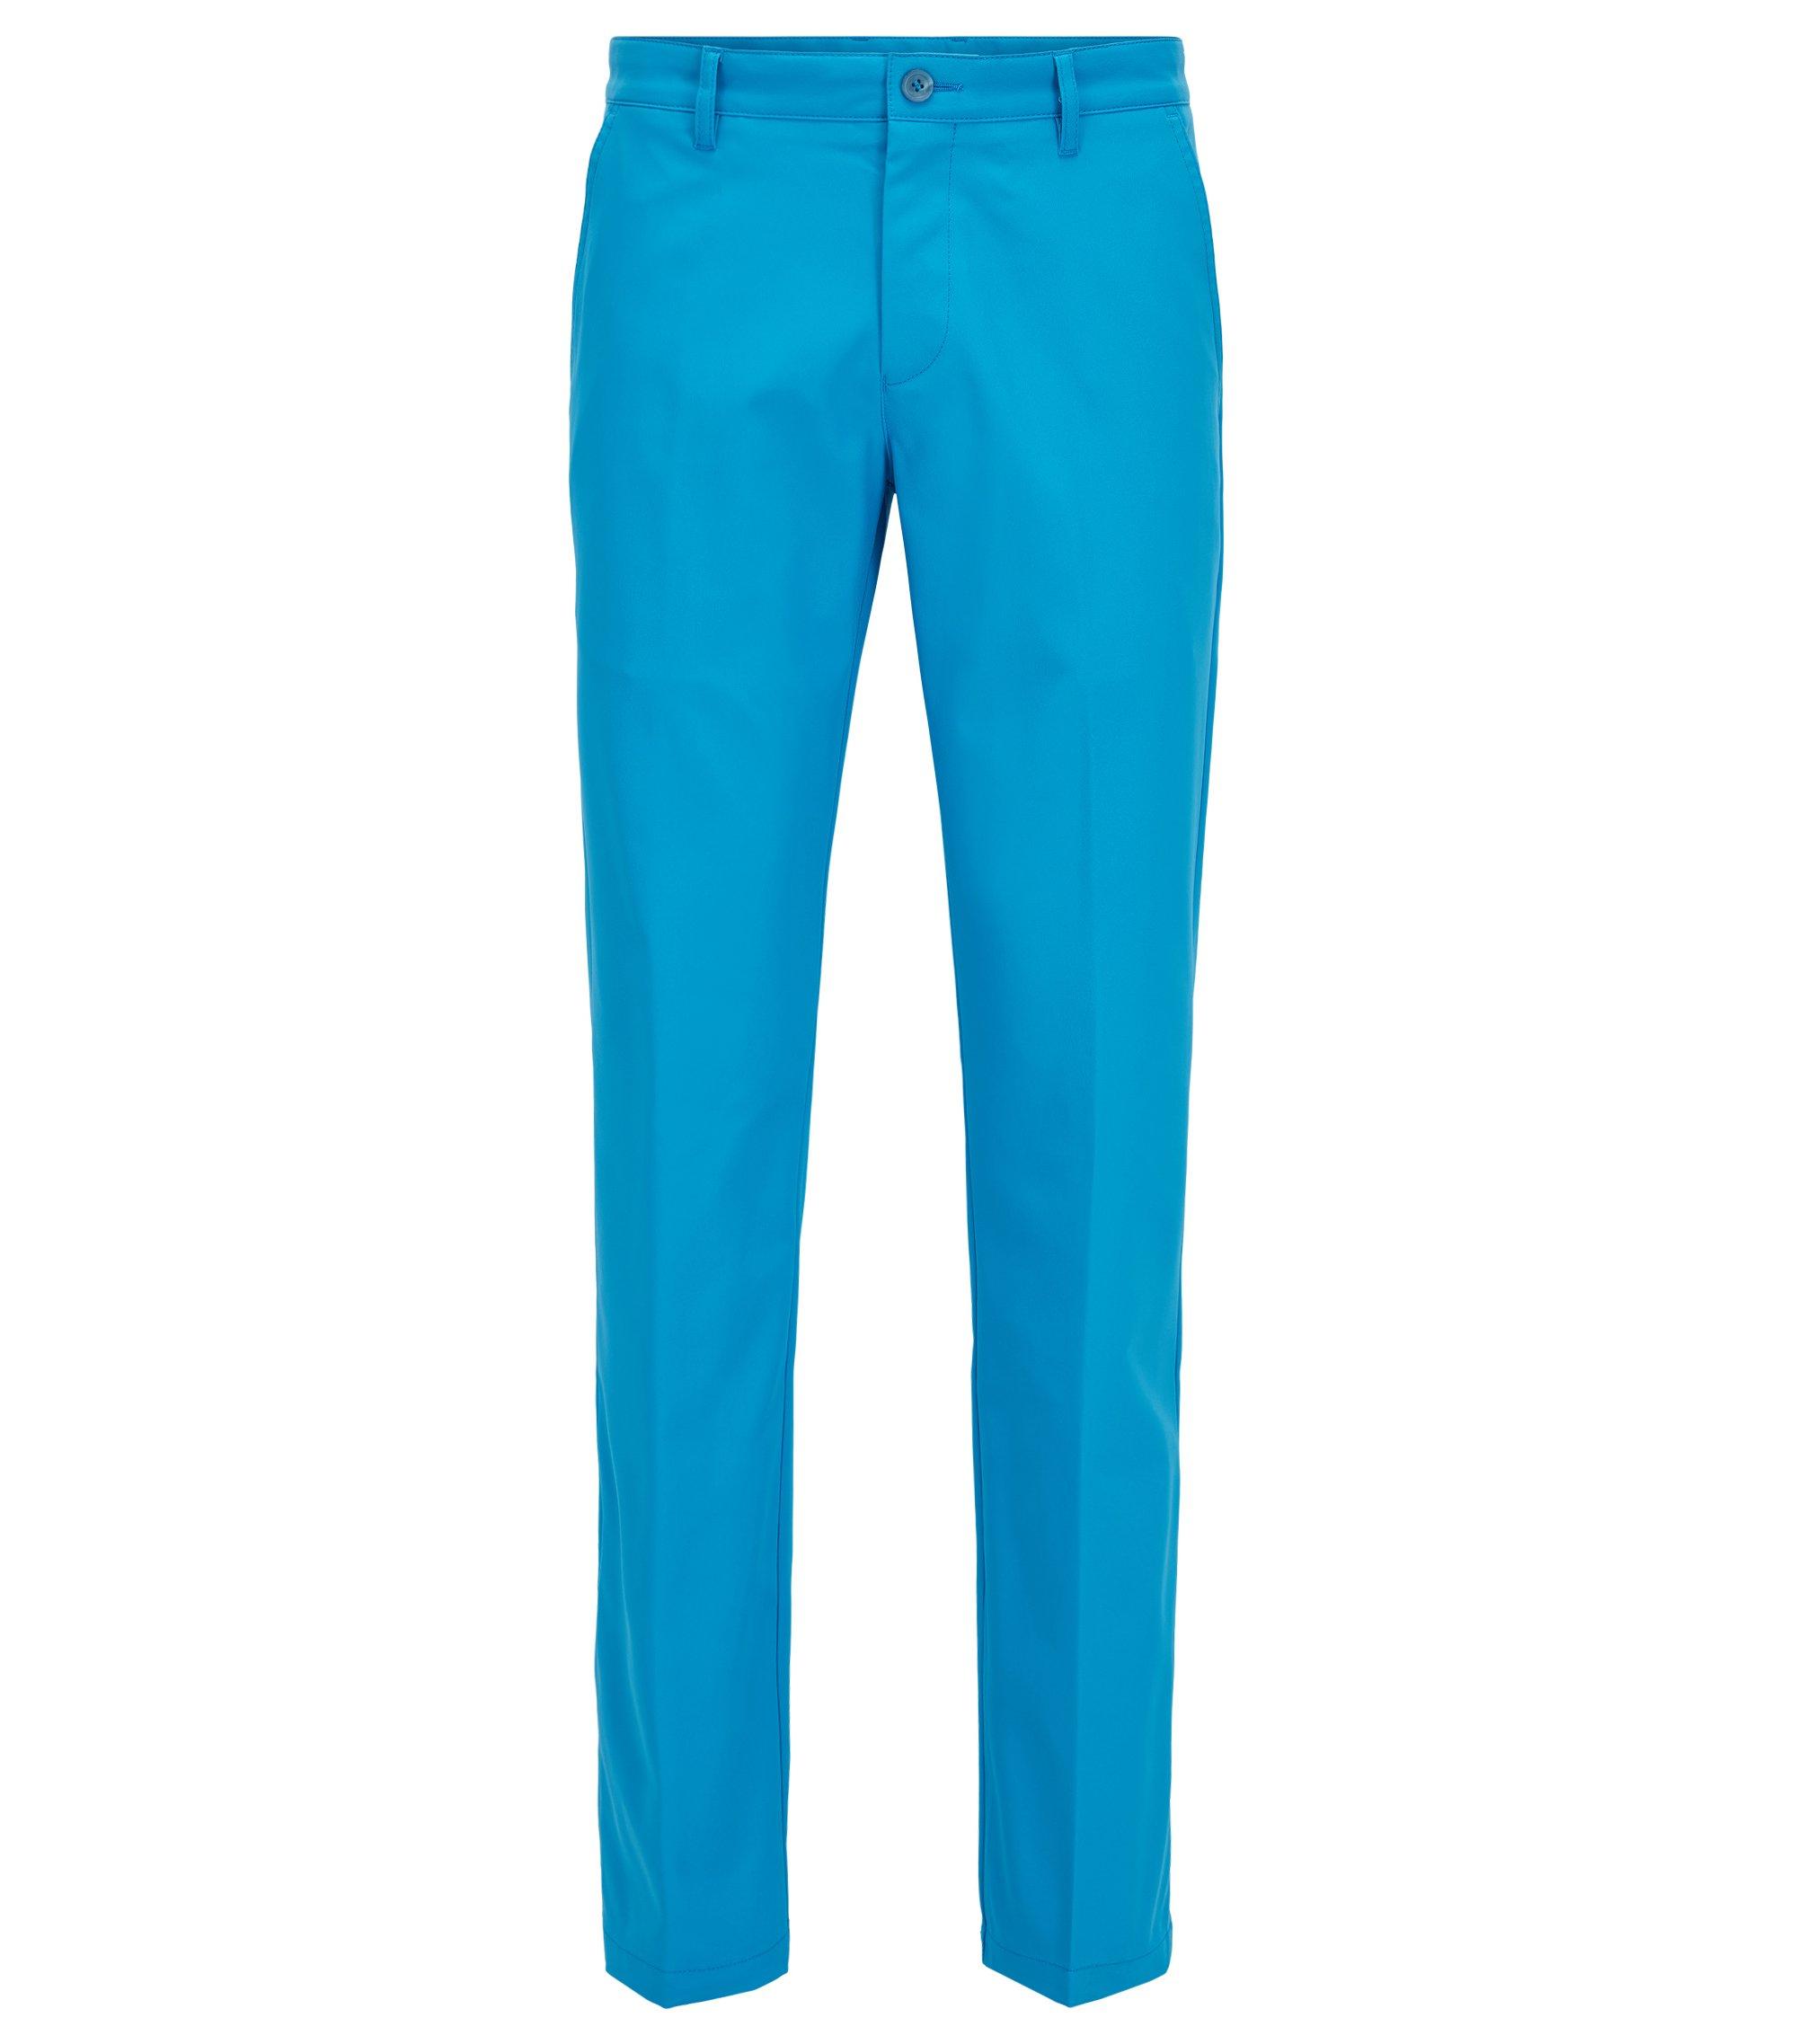 CoolMax Performance Golf Pant, Slim Fit | Hakan , Open Blue